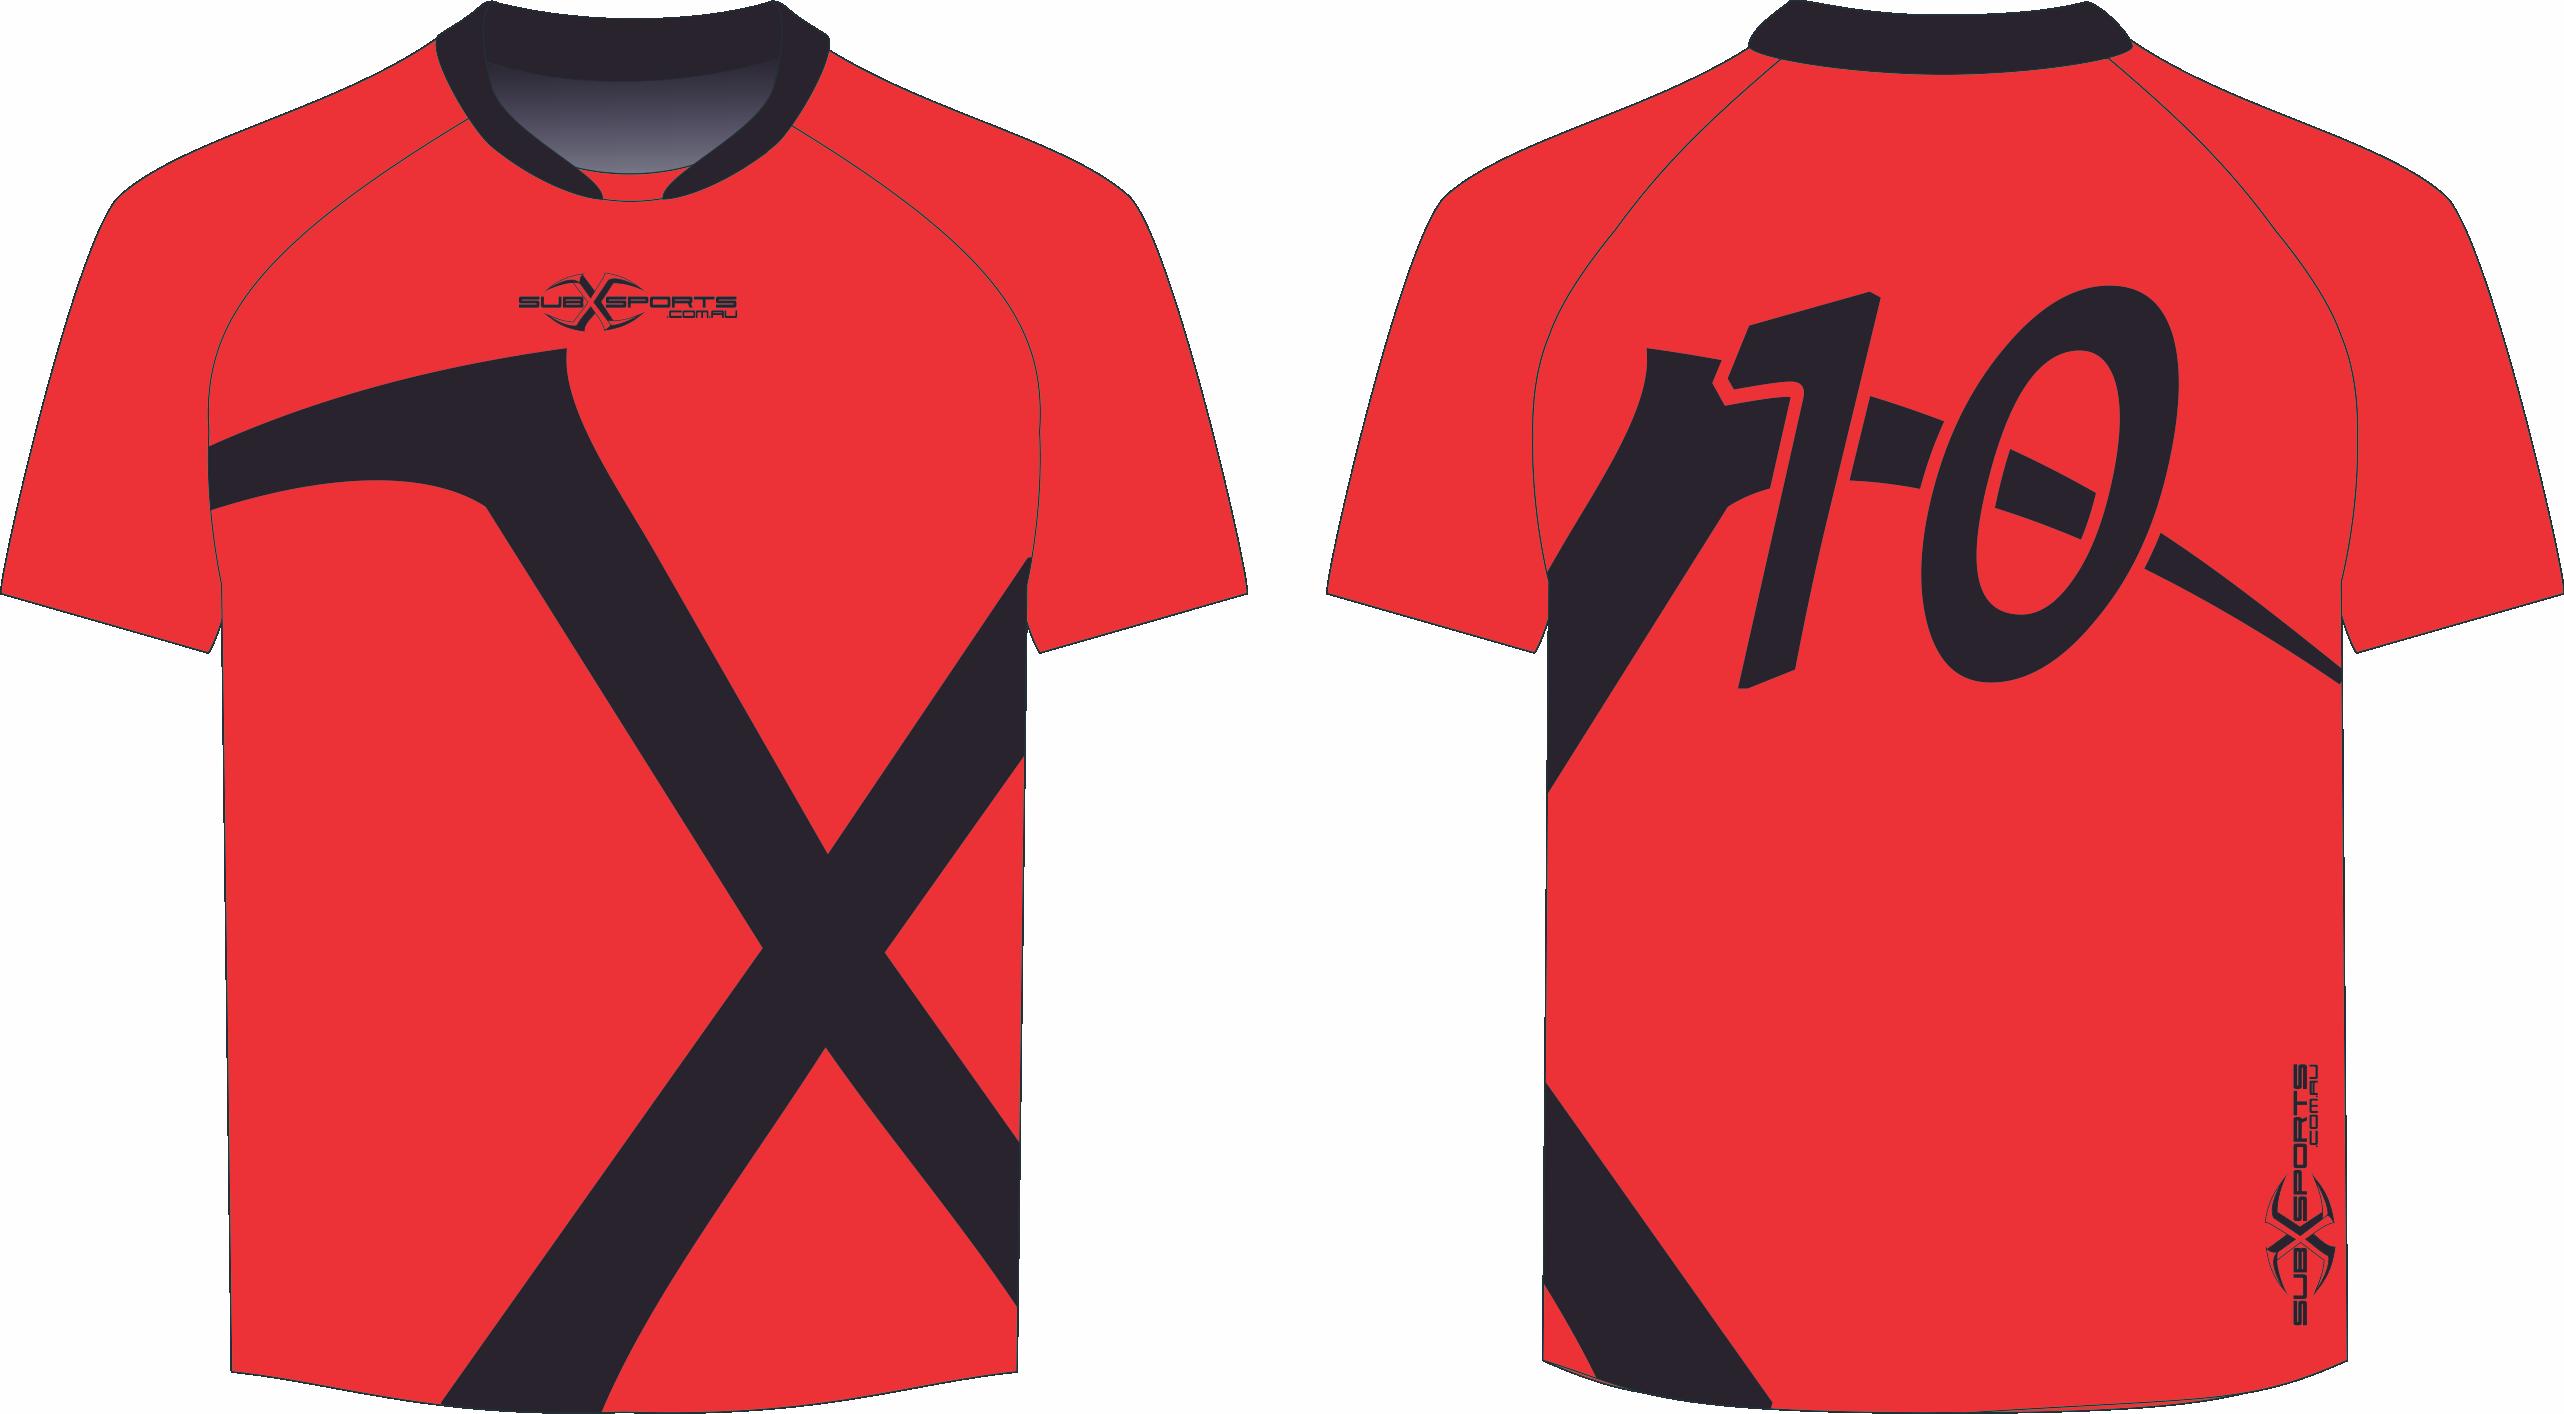 X301XJ Red Black Jerseys.png